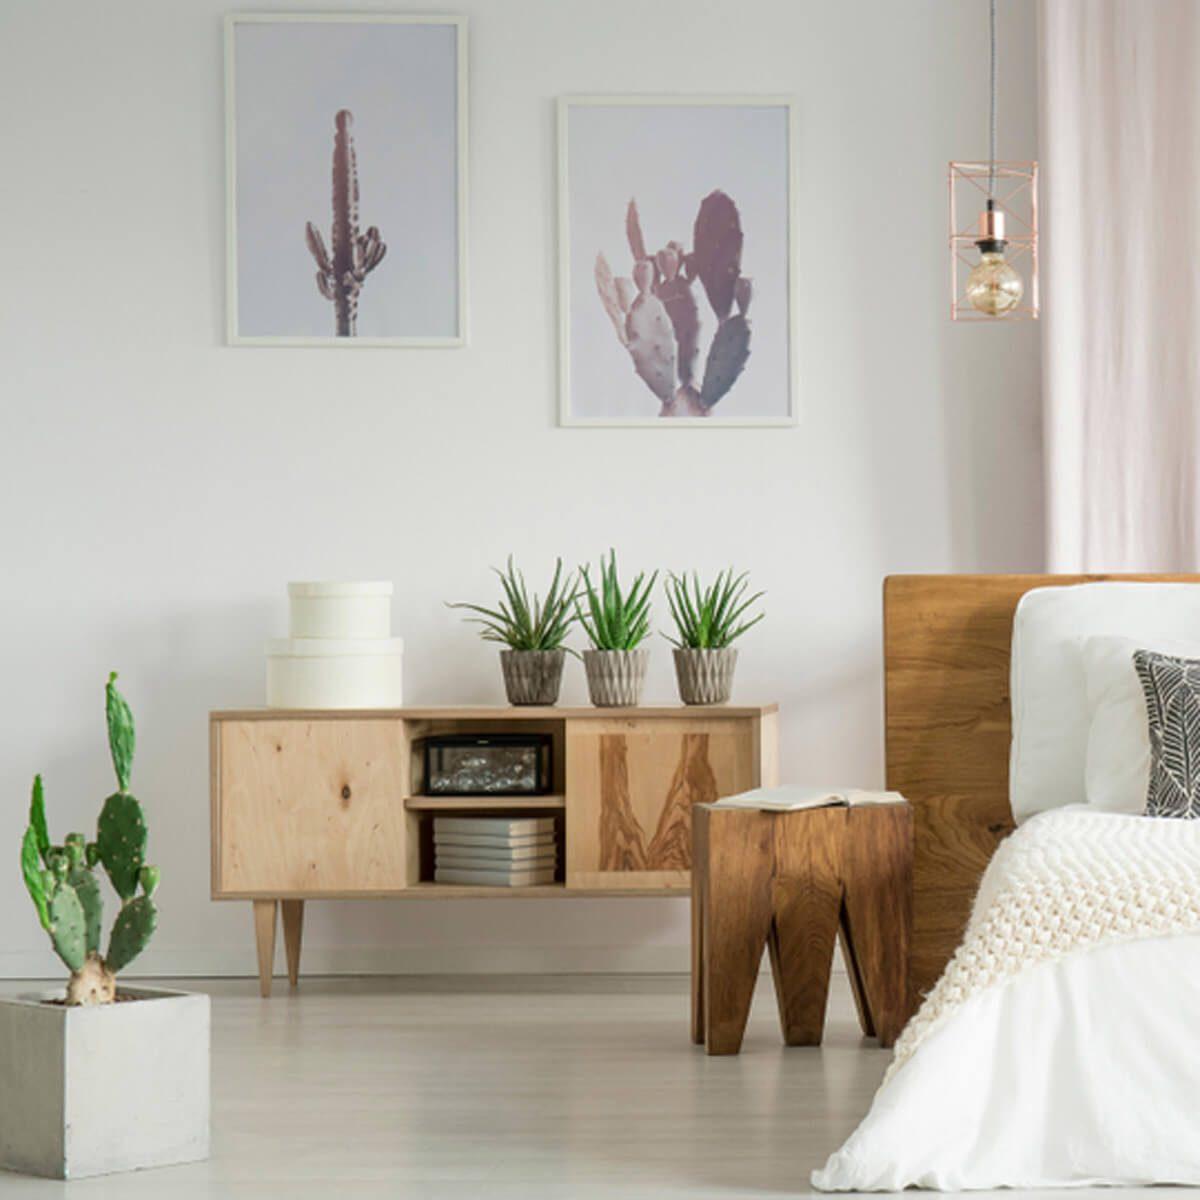 Cactus Artwork Bedroom